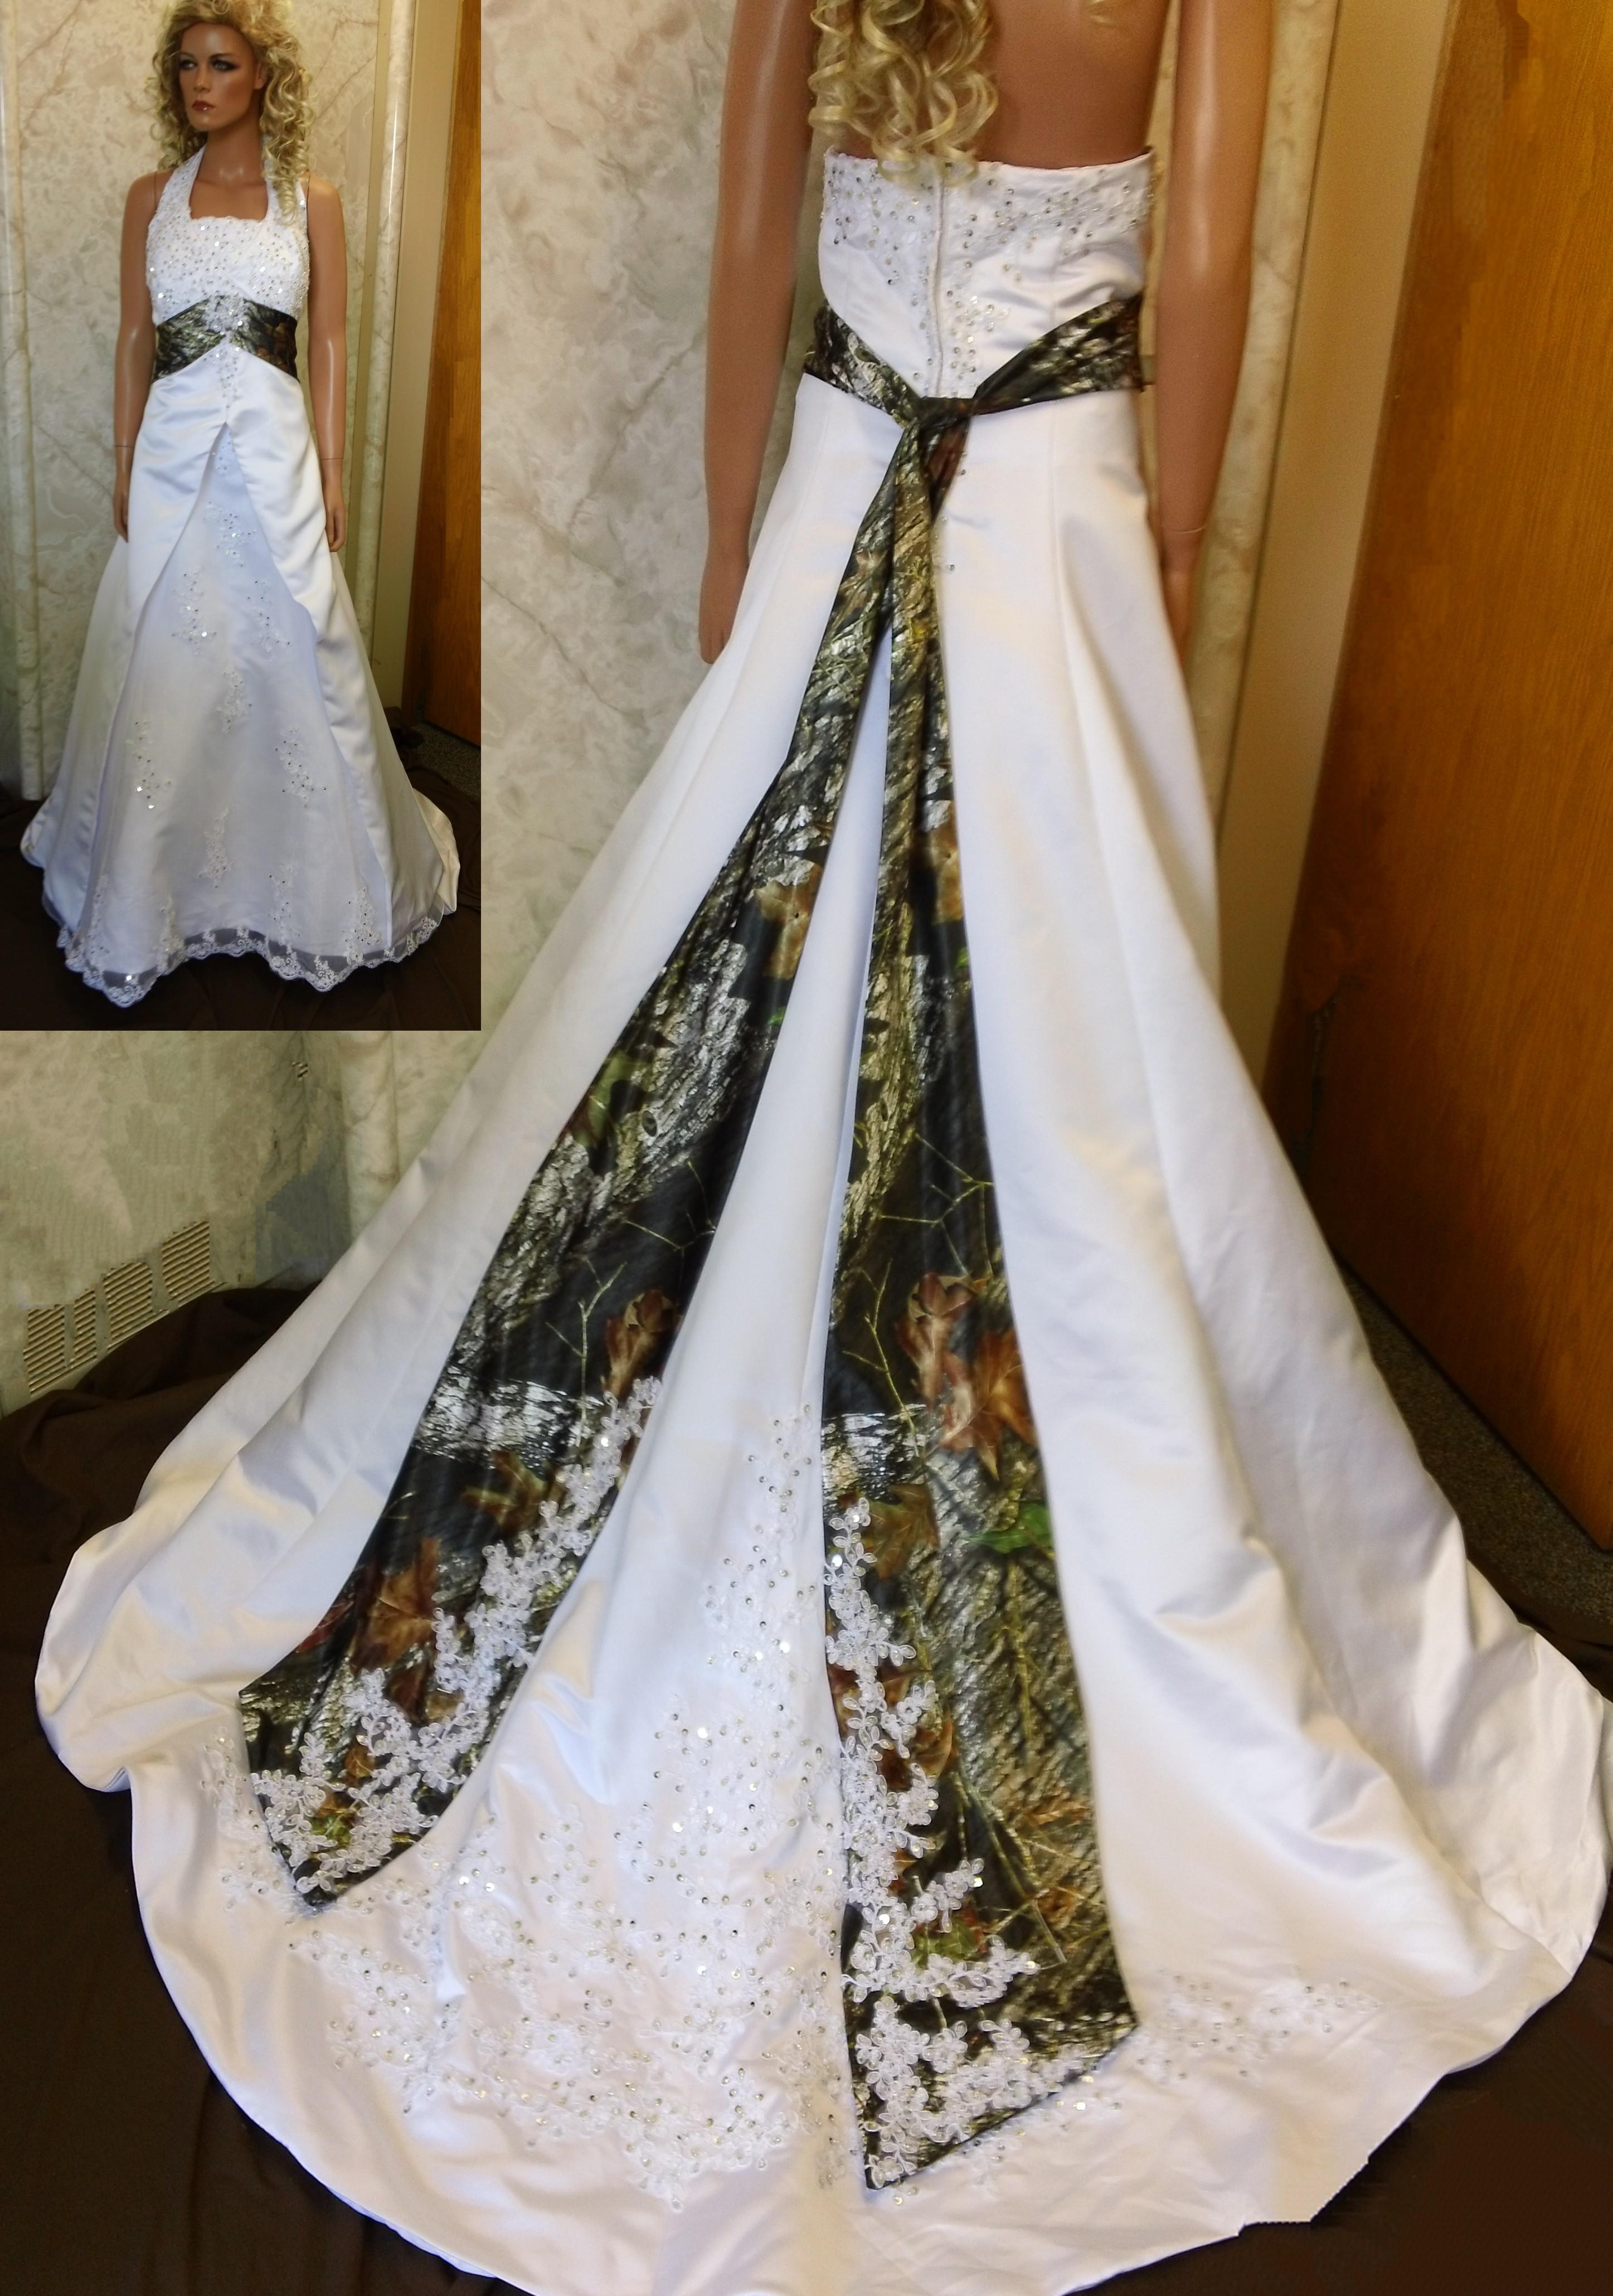 Aimee 74 wedding gown camouflage wedding dress white and camouflage wedding dresses